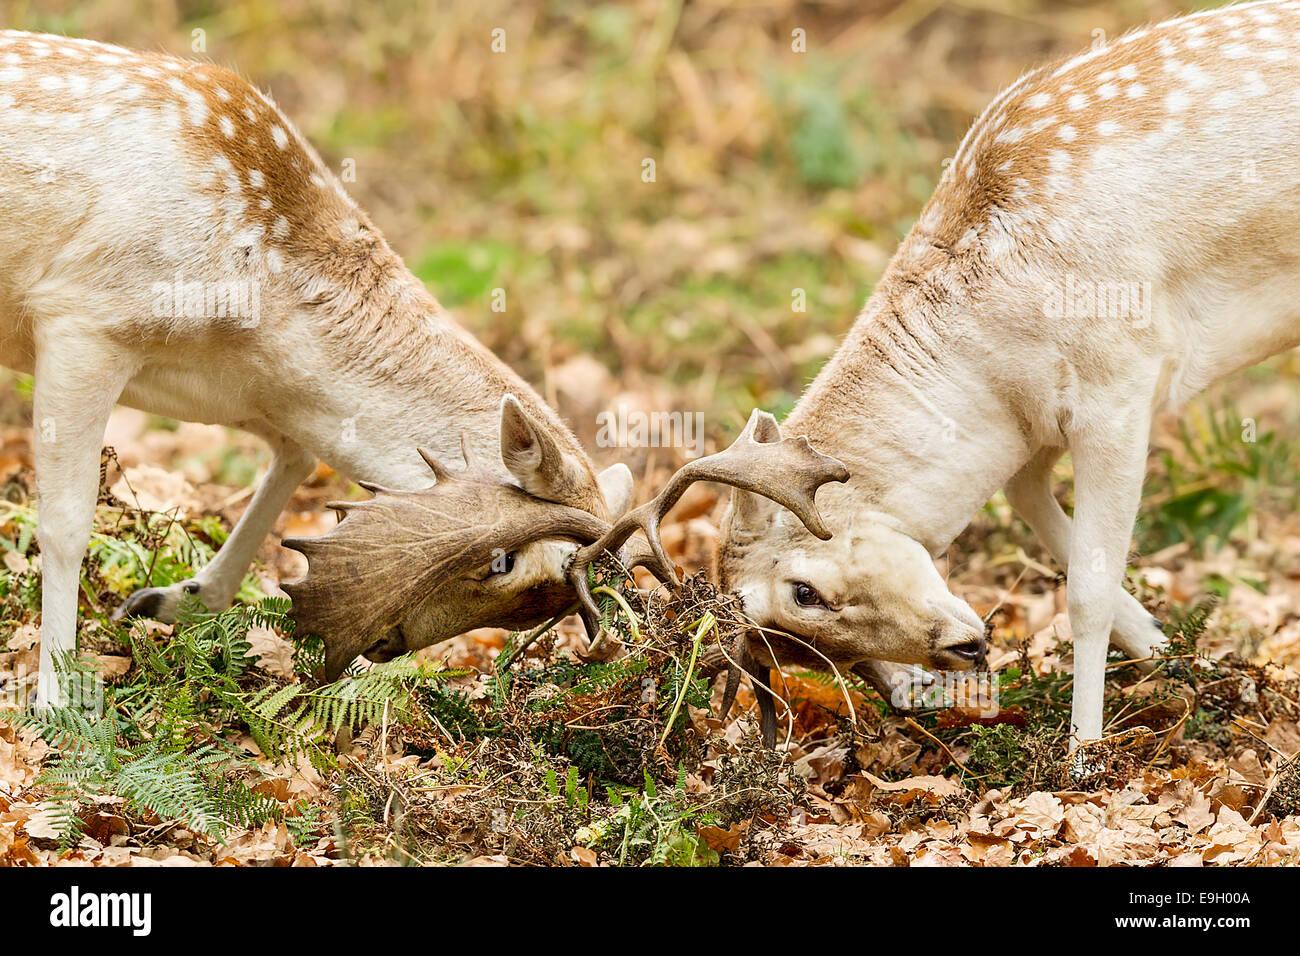 Fallow deer (Dama dama) stags locking antlers during their annual rut - Stock Image